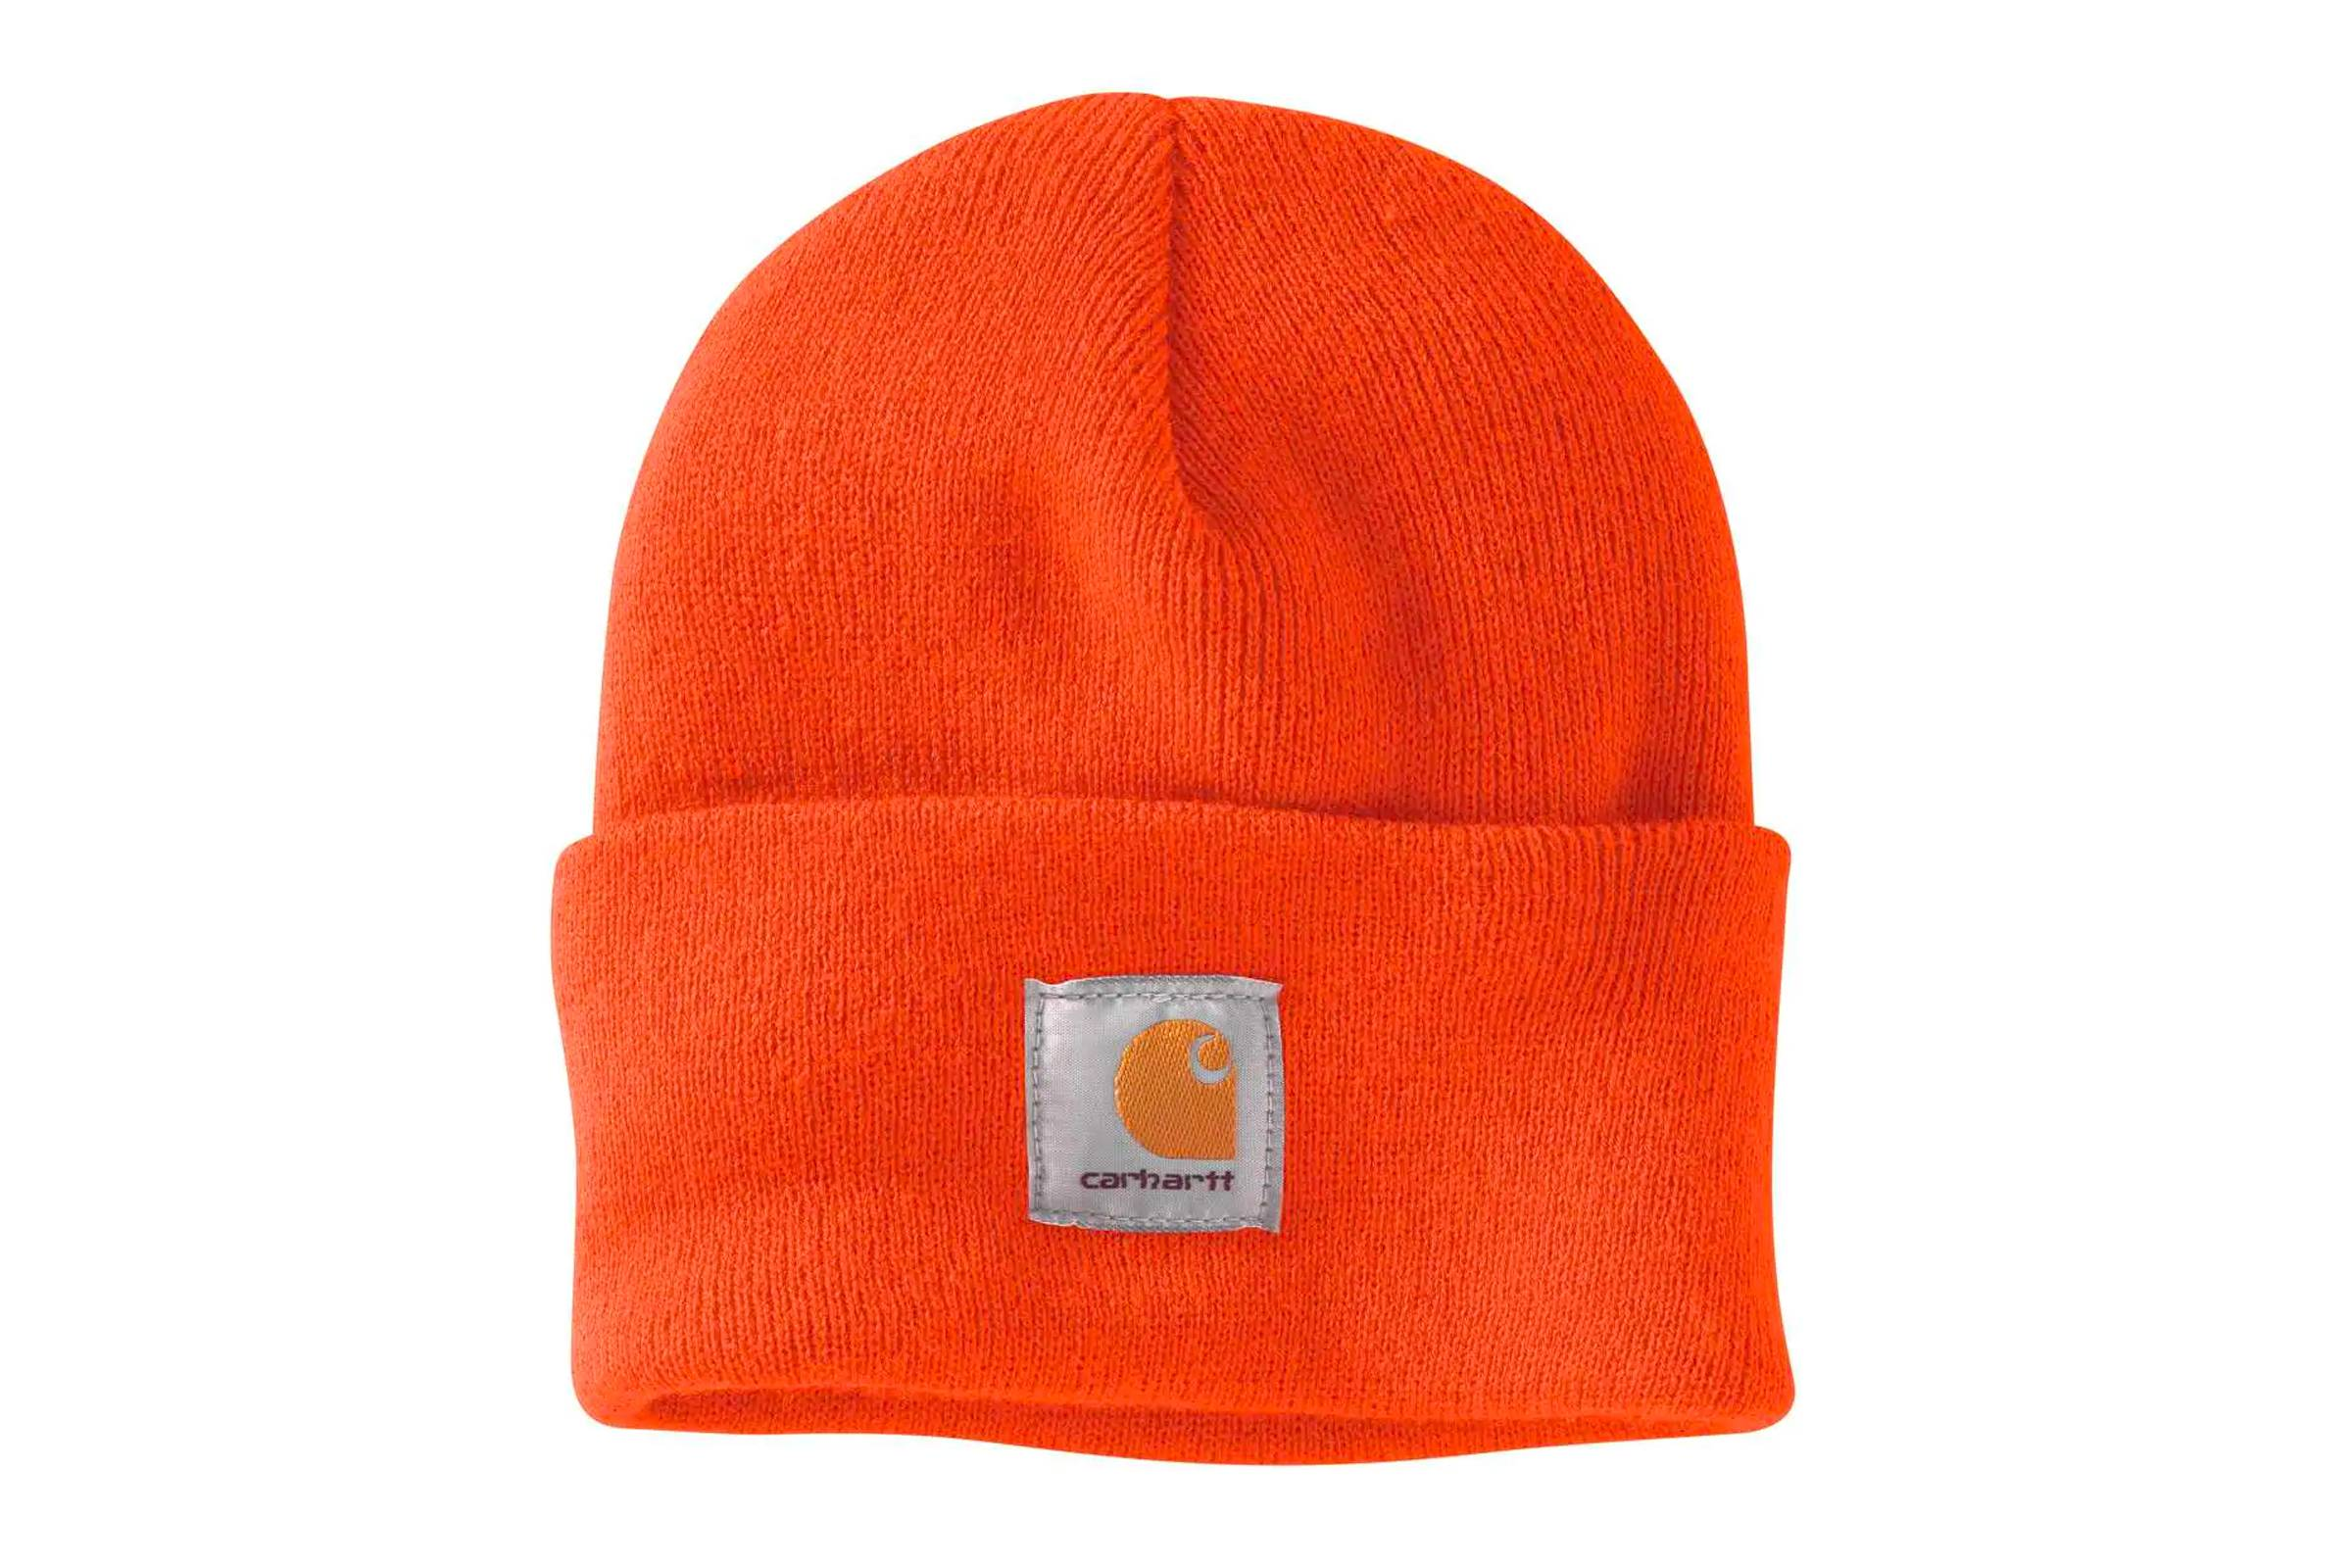 2. Carhartt Watch Hat